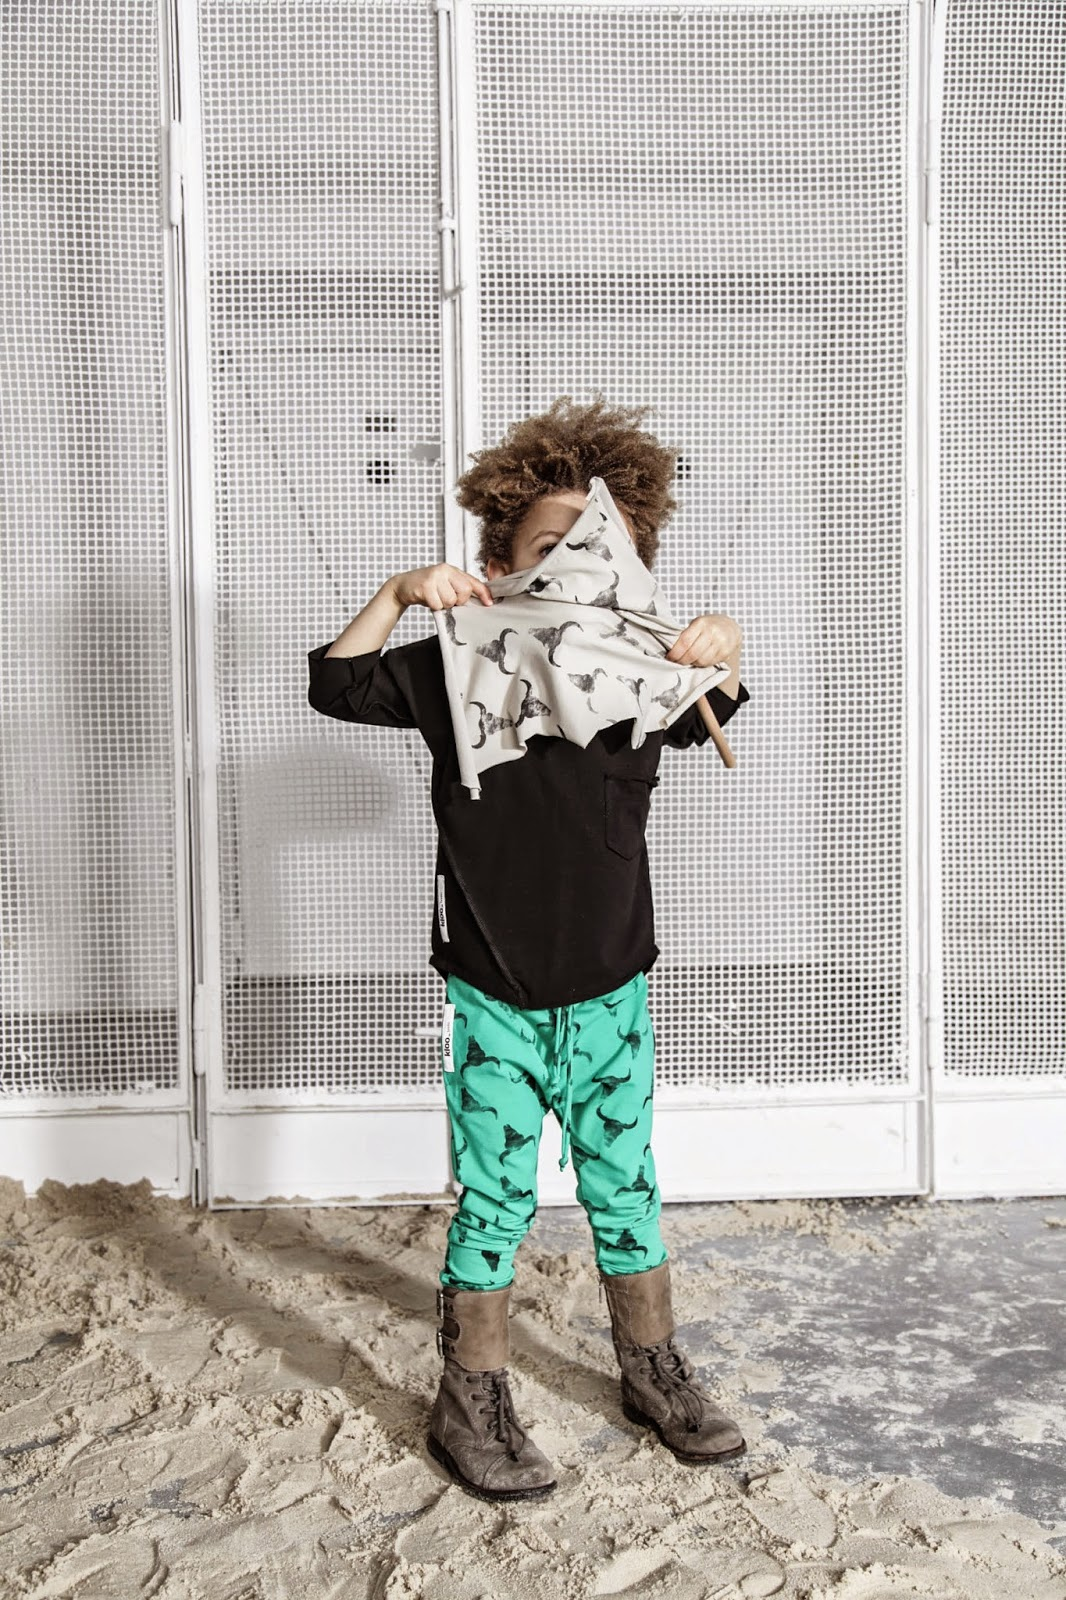 Kloo by Booso - Polish kids fashion spring-summer 2015 - turquoise bull's head